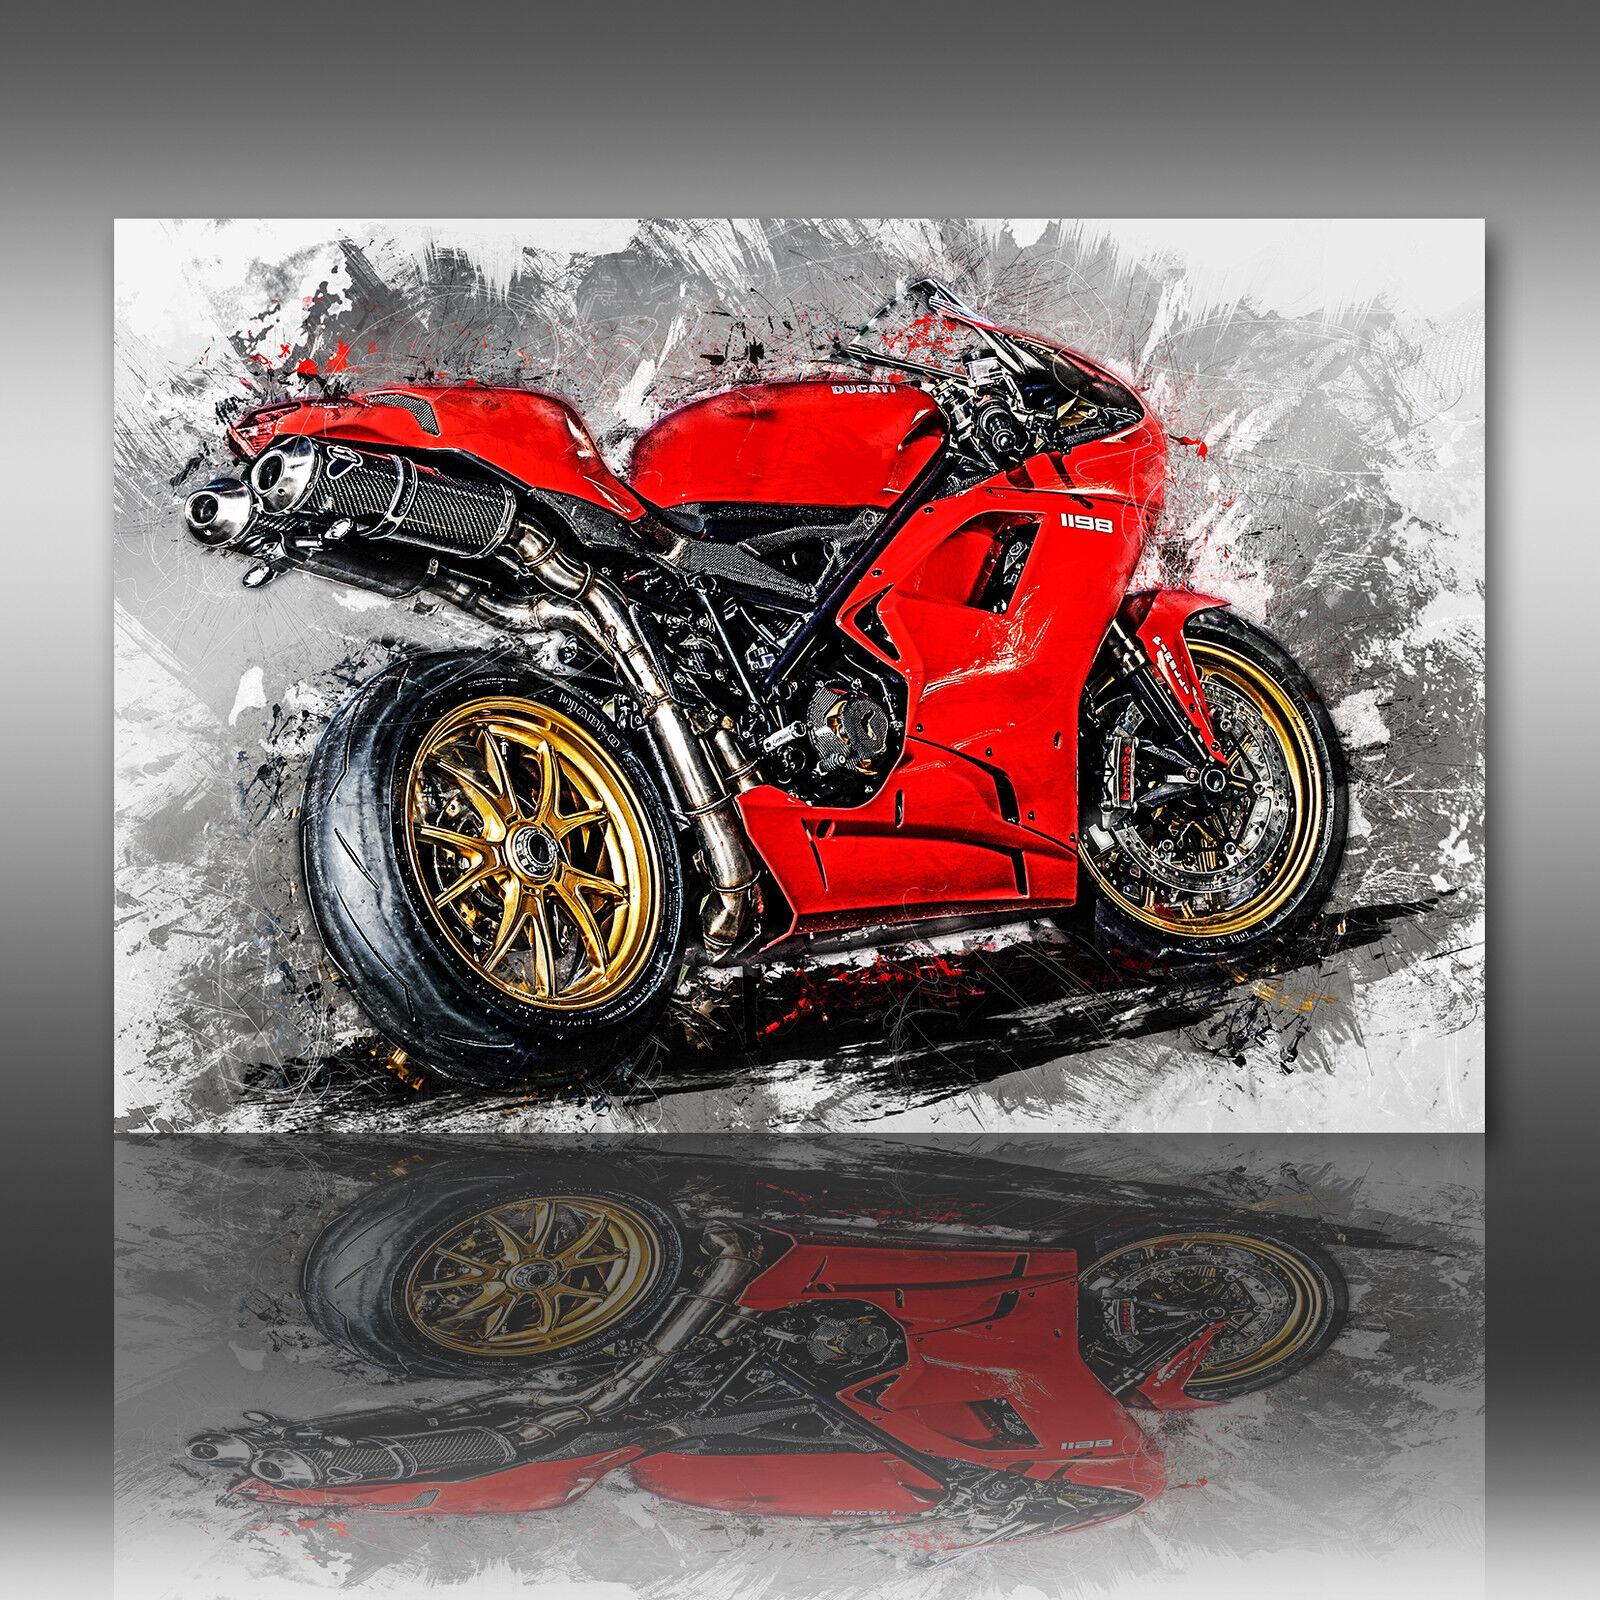 Ducati 1098 Leinwand Bild Motorrad Deko Wandbild Poster XXL Kunstdruck